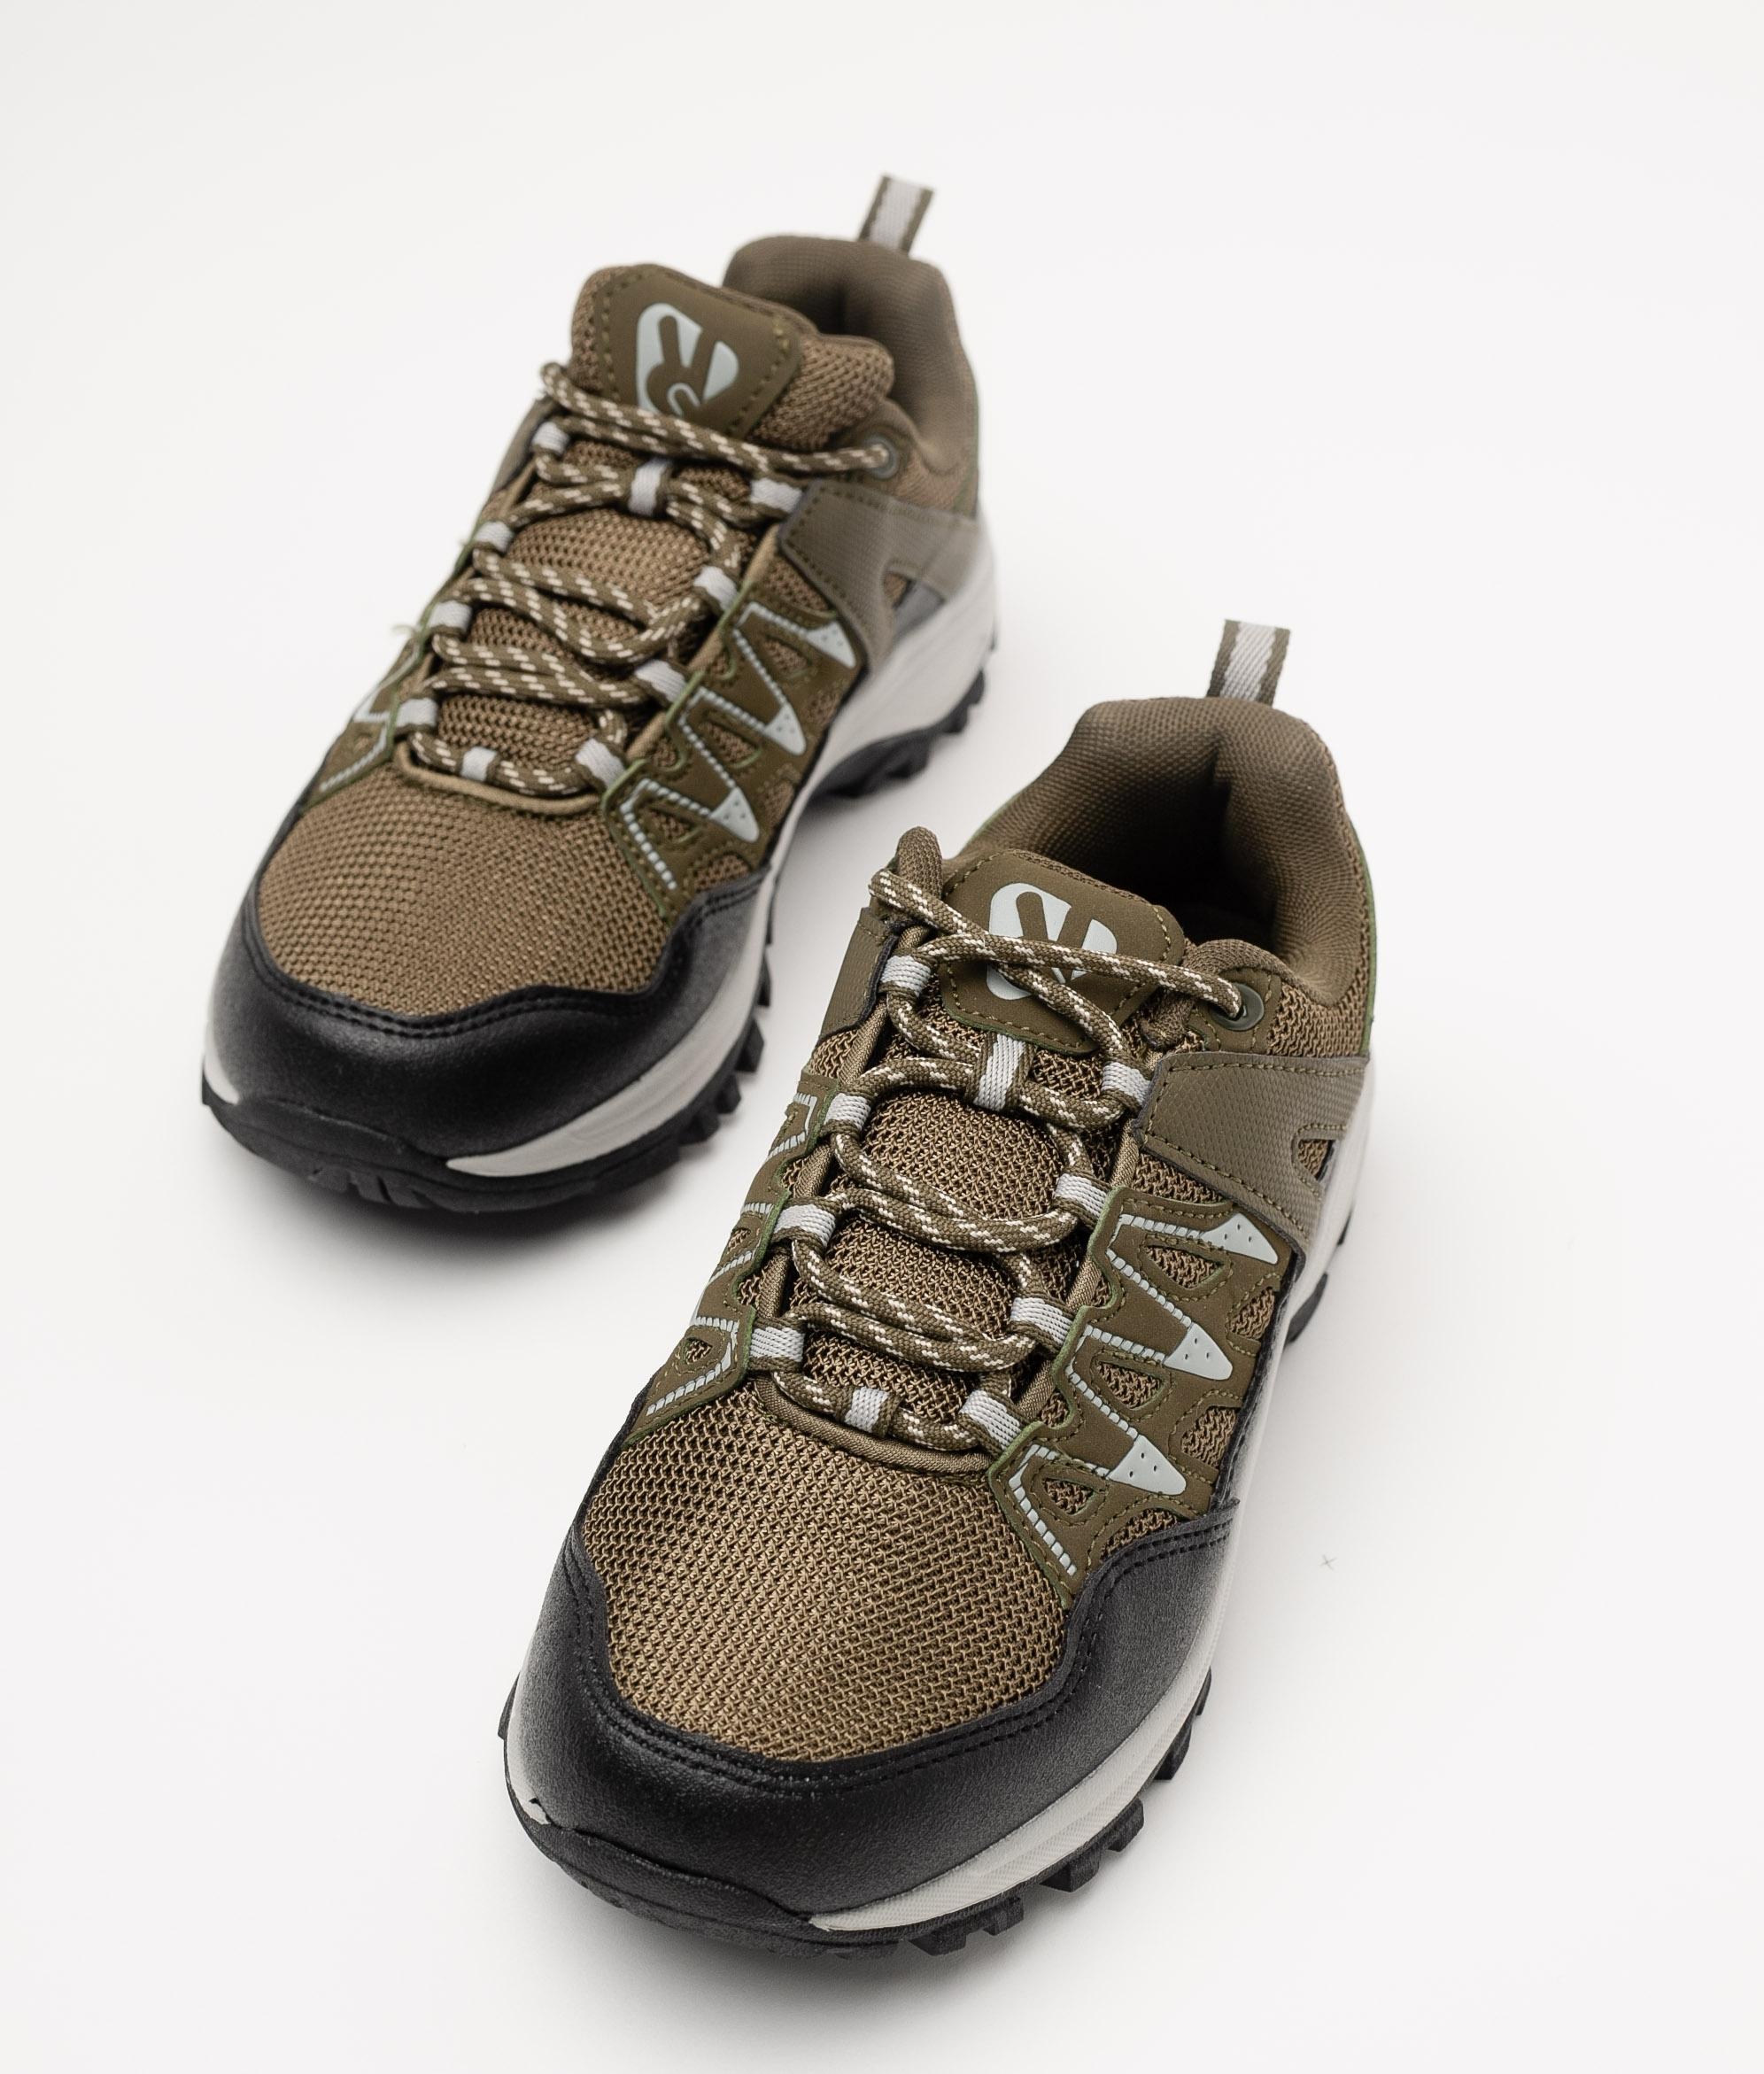 Sneakers Treves Roly - Khaki